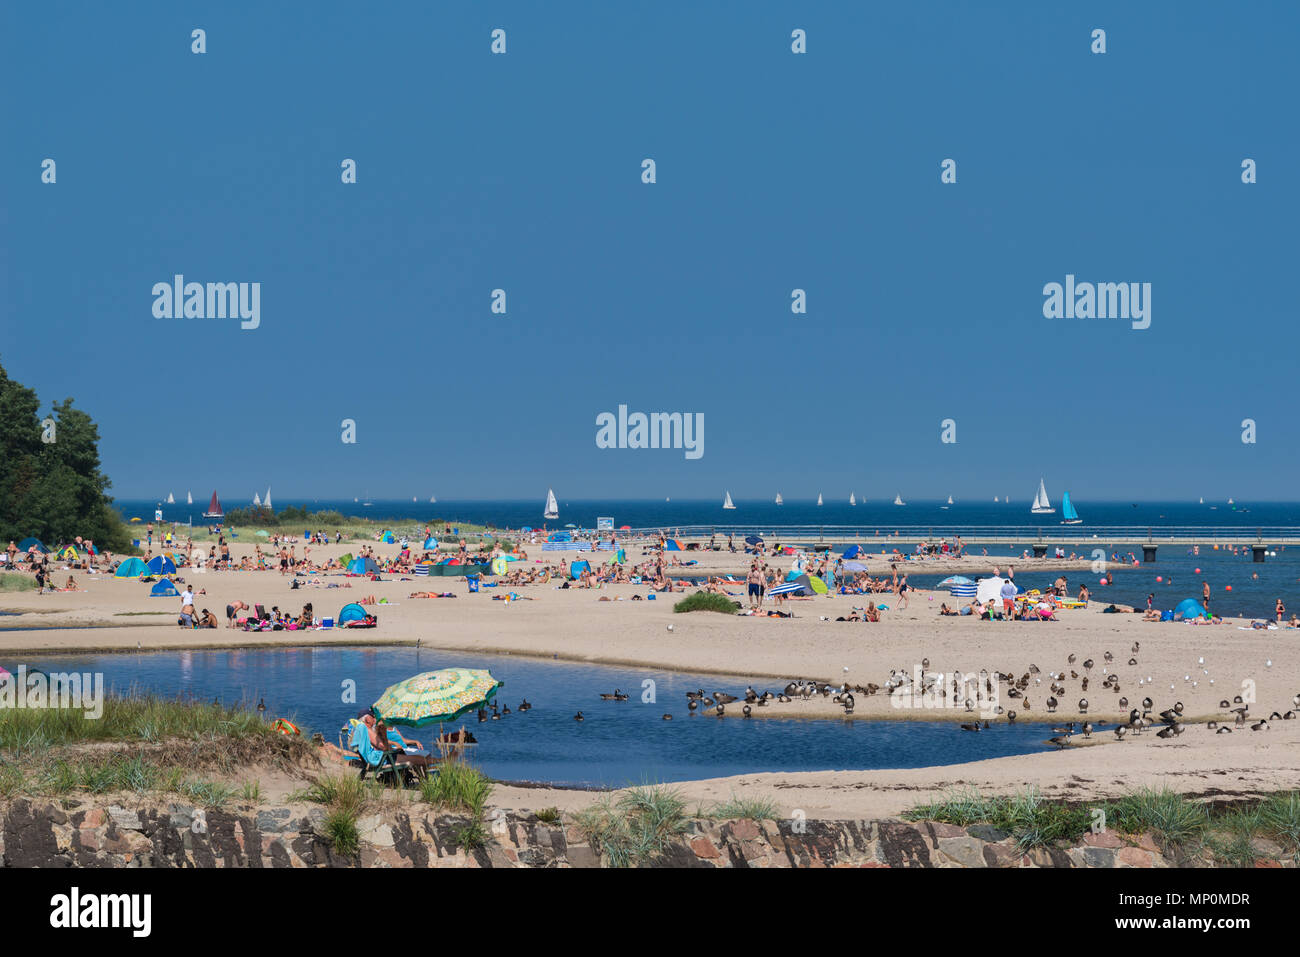 Relaxing on a hot summer day at the beach 'Falkensteiner Strand', Kiel Fjord, Kiel, Germany, - Stock Image